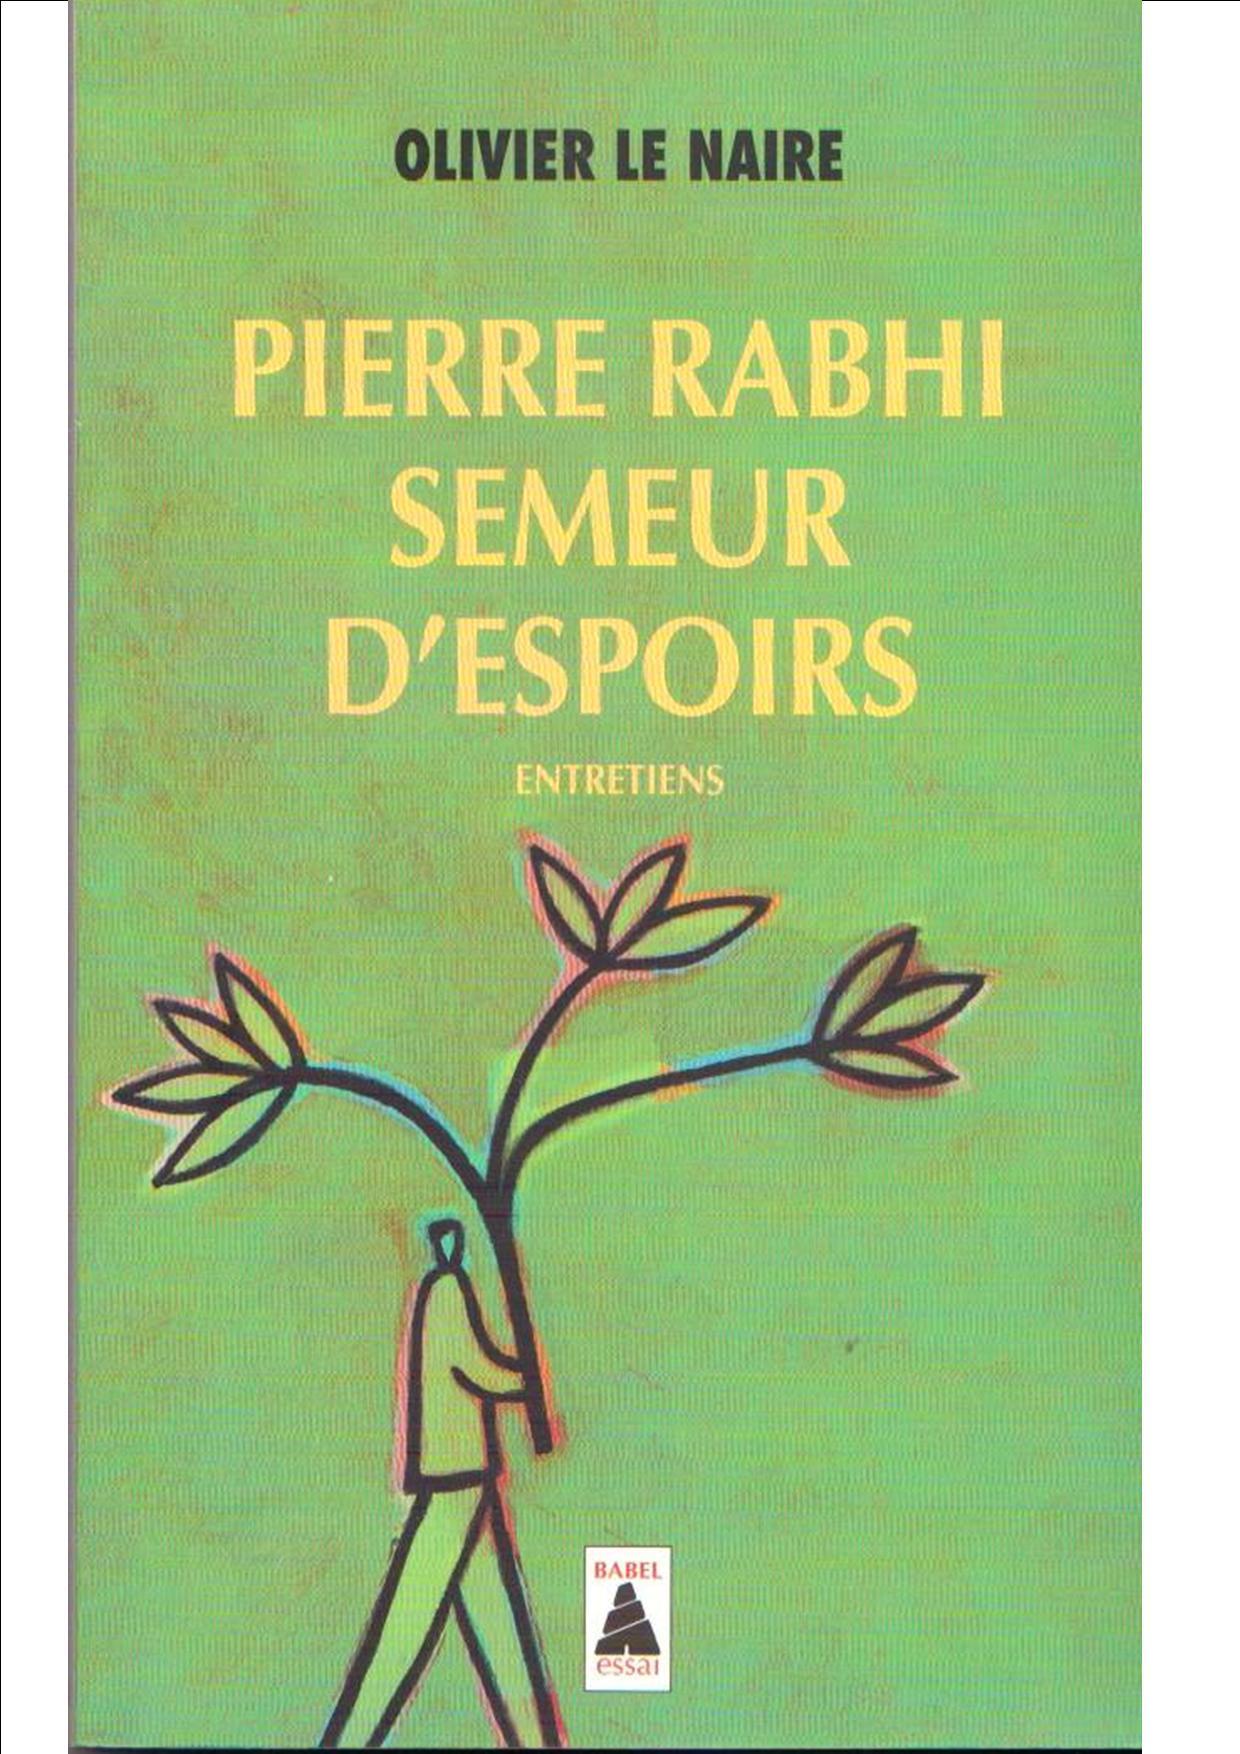 Rabhi semeur d espoirs